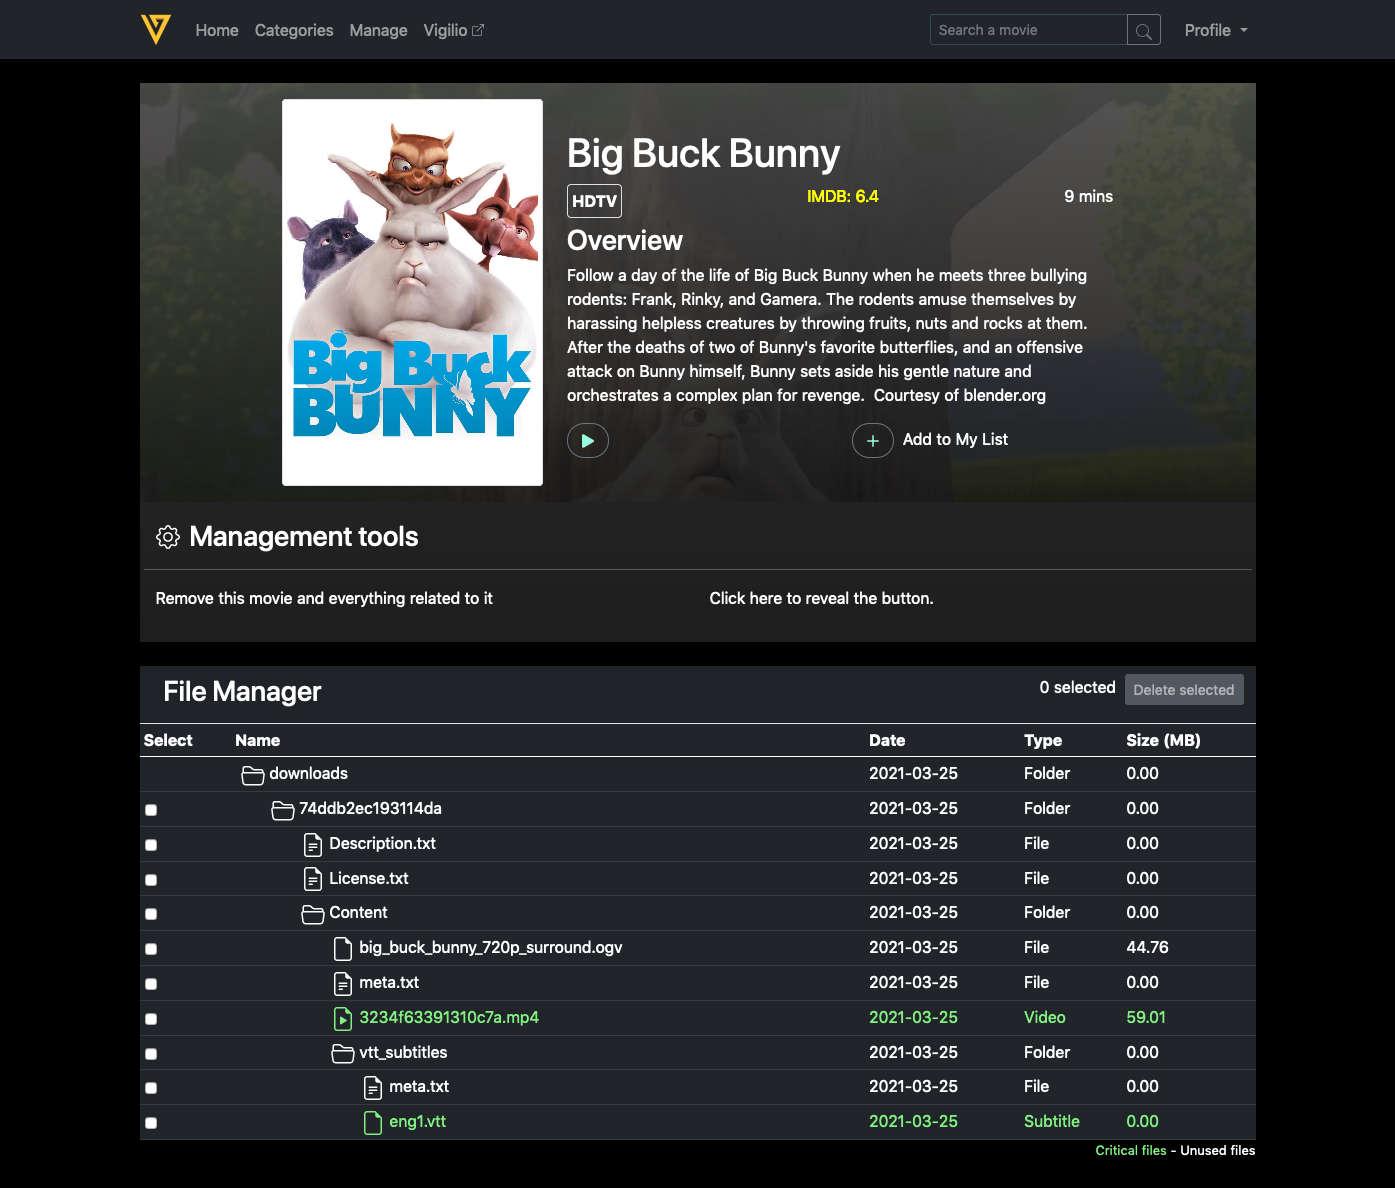 movie details page